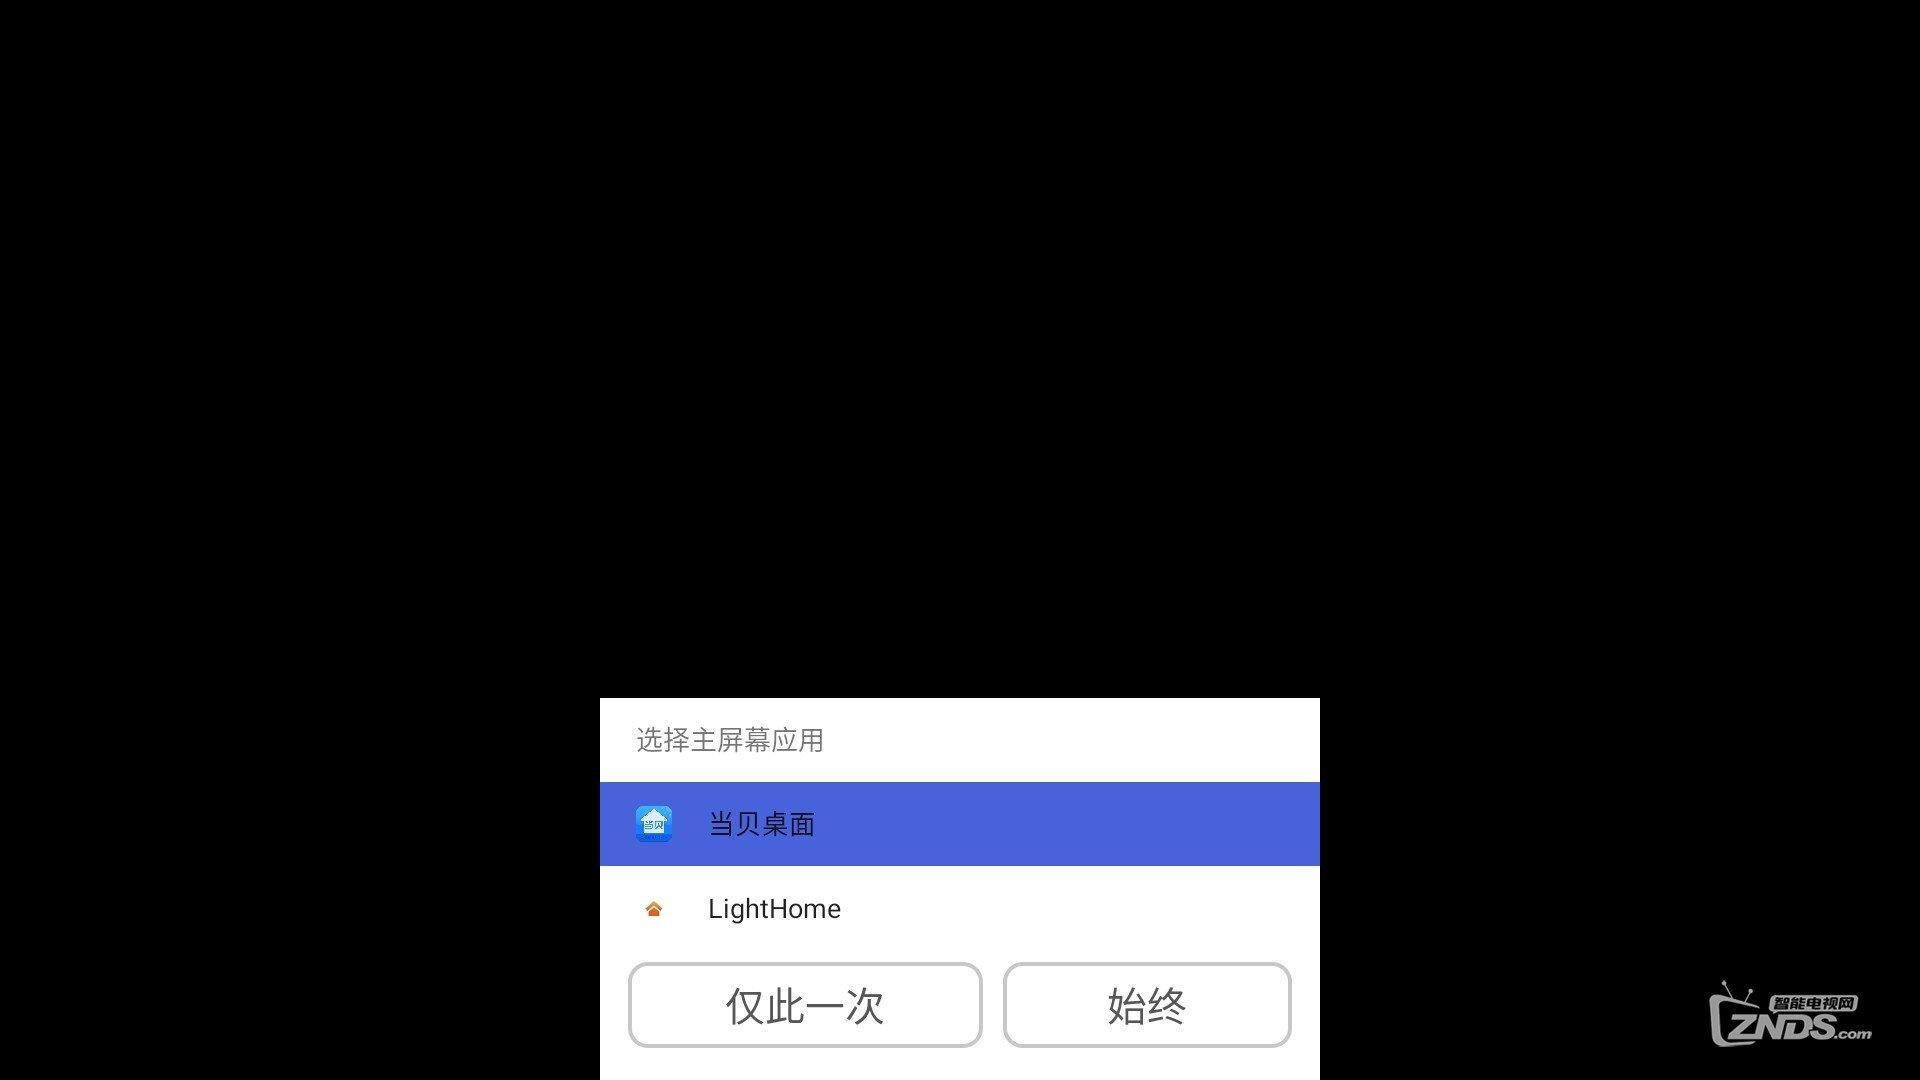 phibox_2018-04-12-02-08-38.jpg